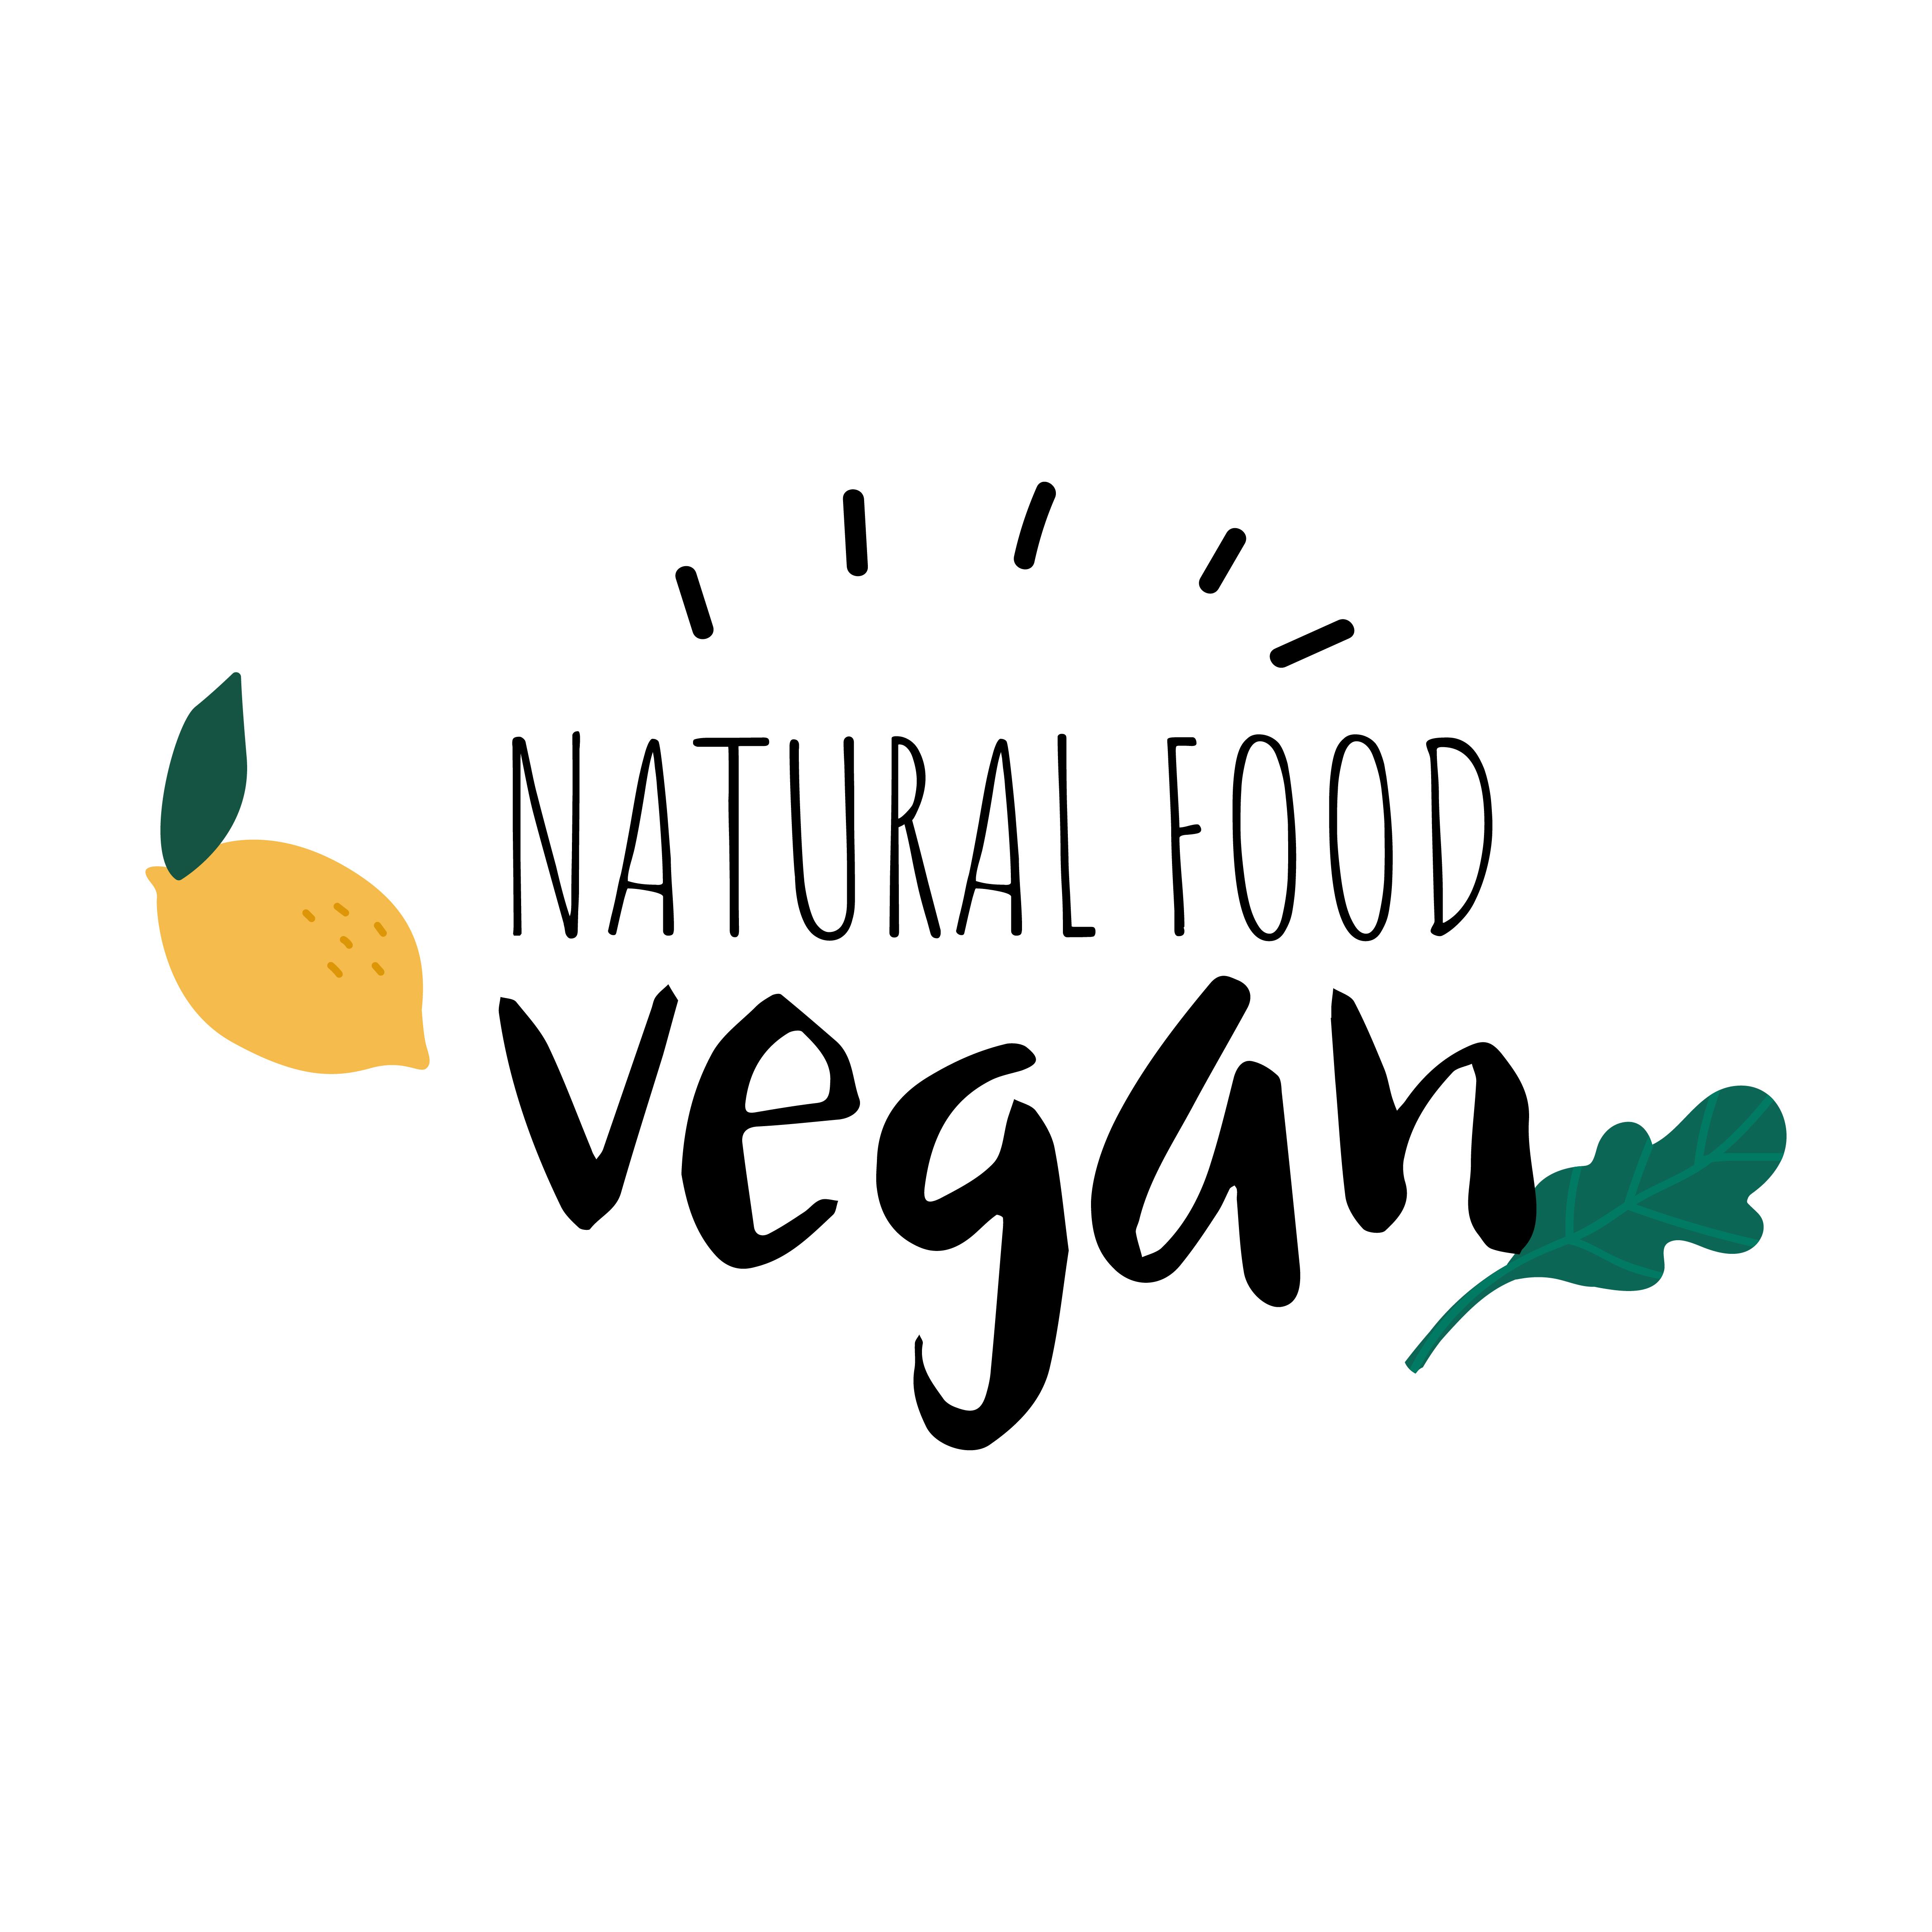 Collection Of Badges For A Restaurant: Natural Food Vegan Logo Vector